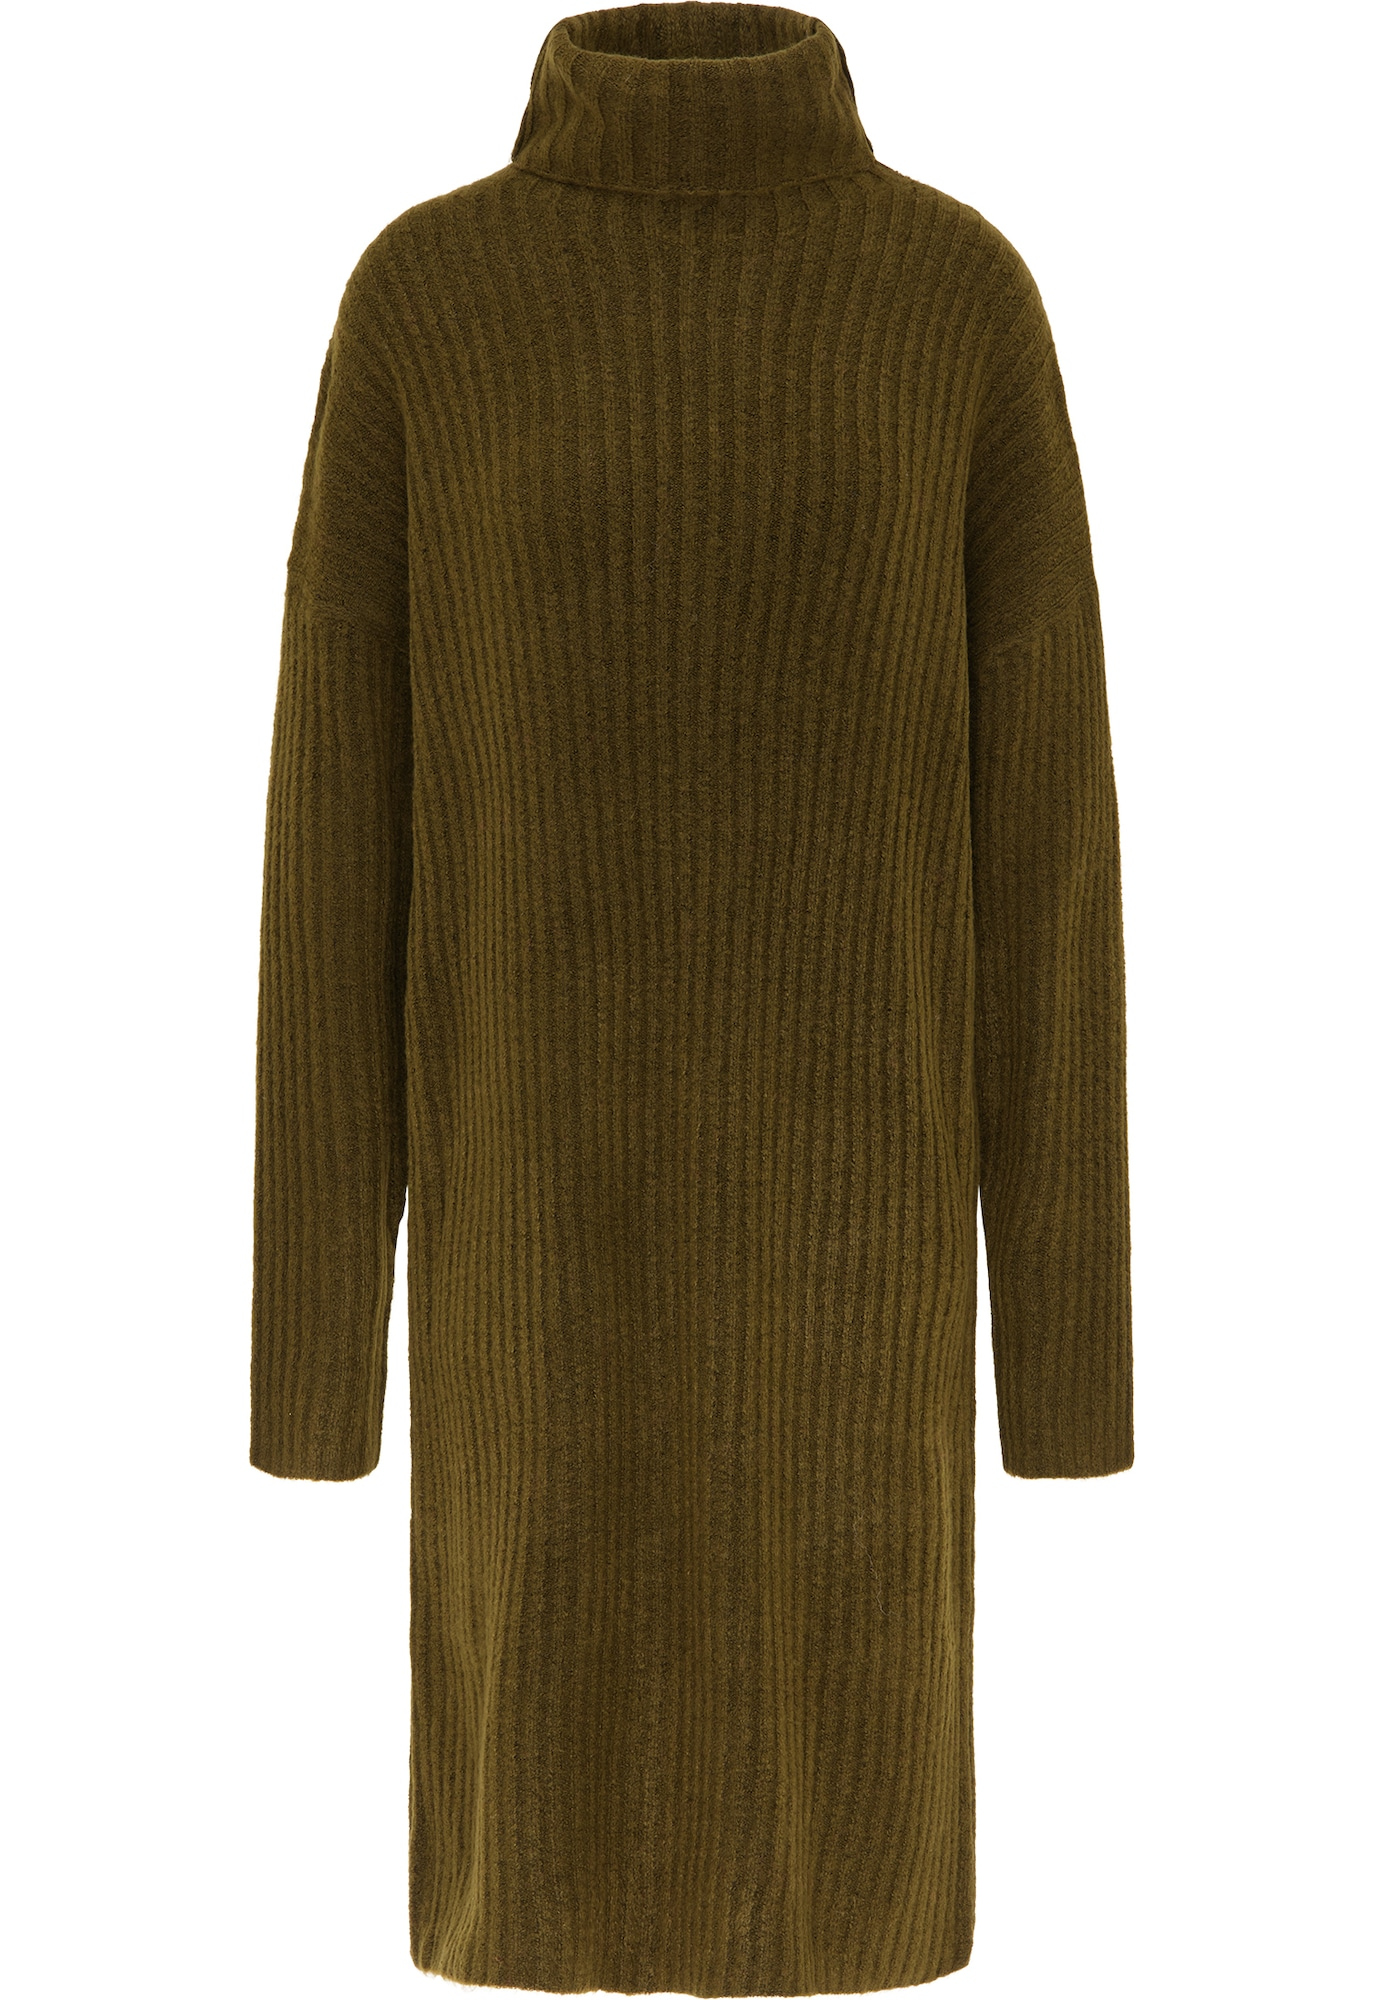 MYMO Megzta suknelė alyvuogių spalva